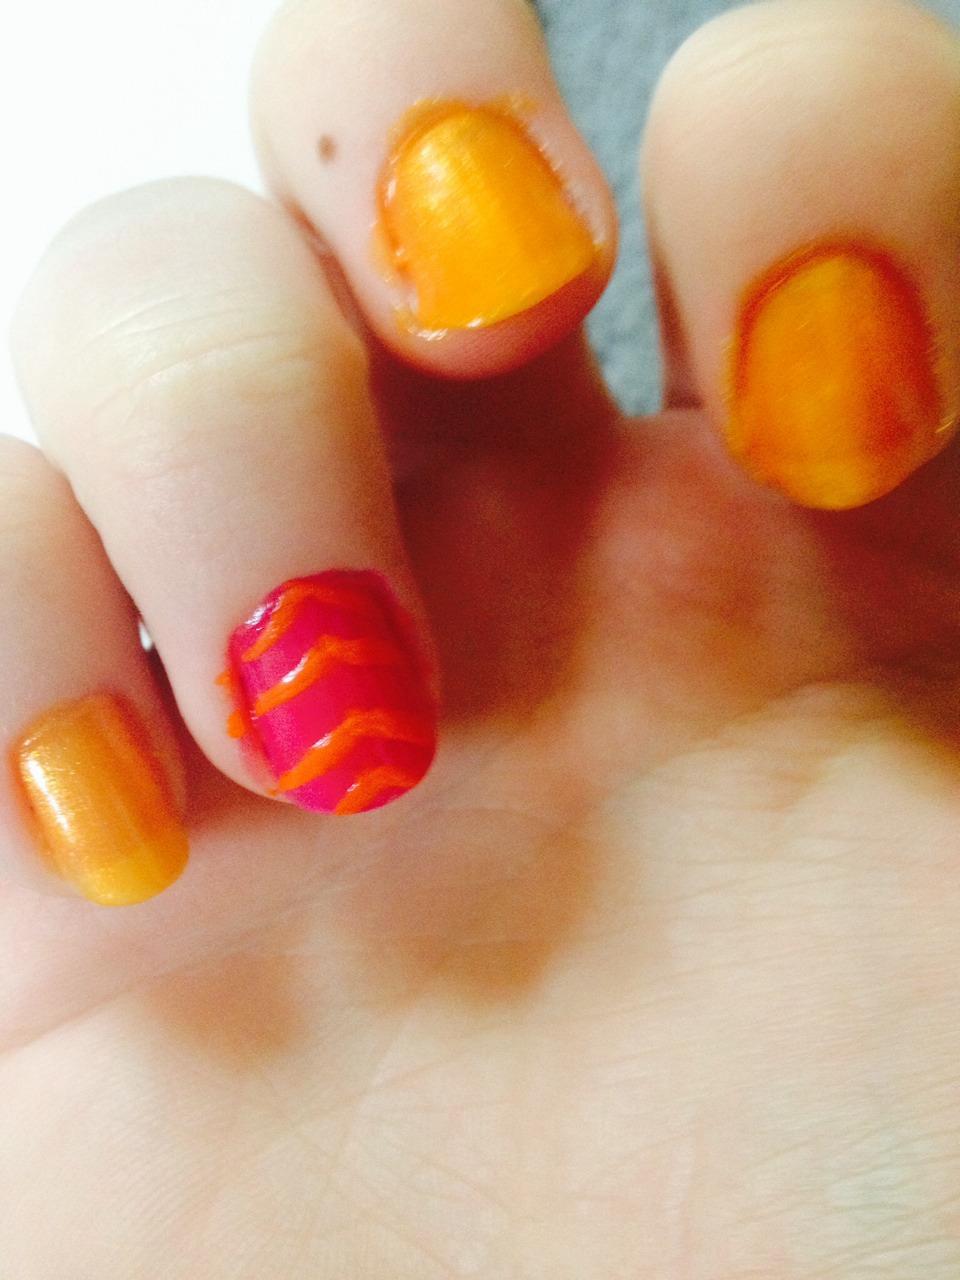 ... Paint orange stripes on your nails